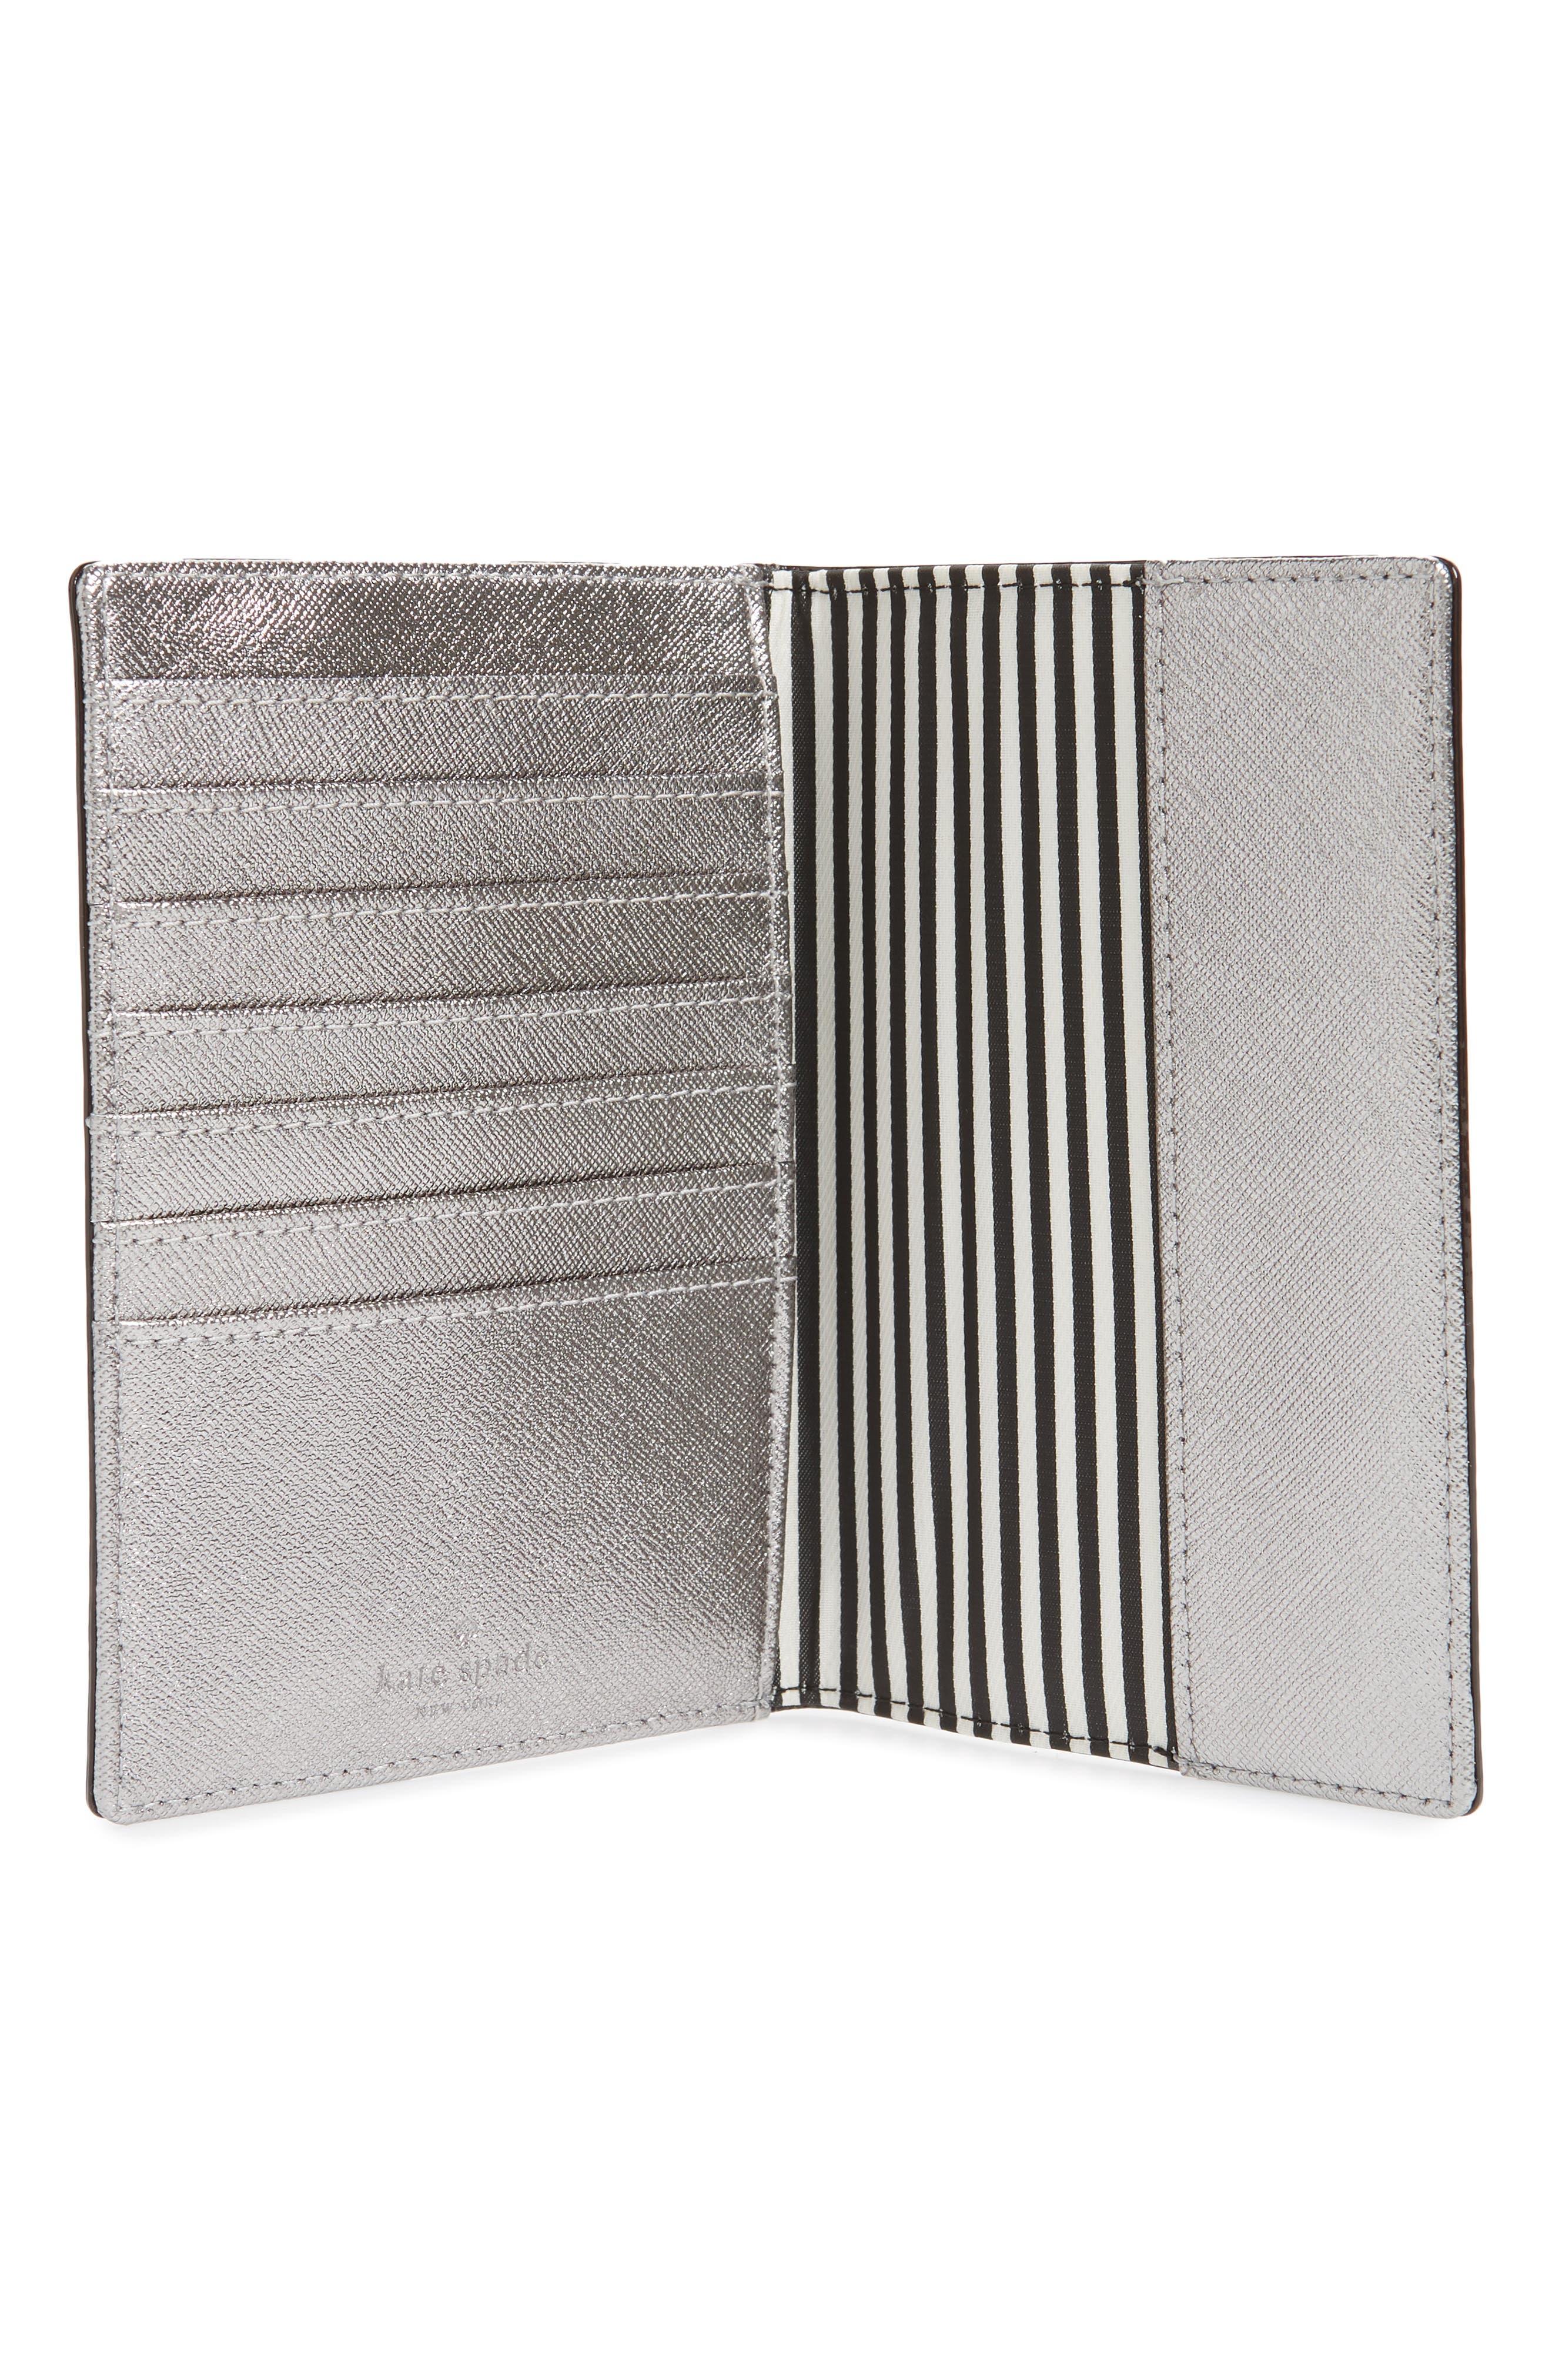 'cameron street' leather passport holder,                             Alternate thumbnail 2, color,                             040